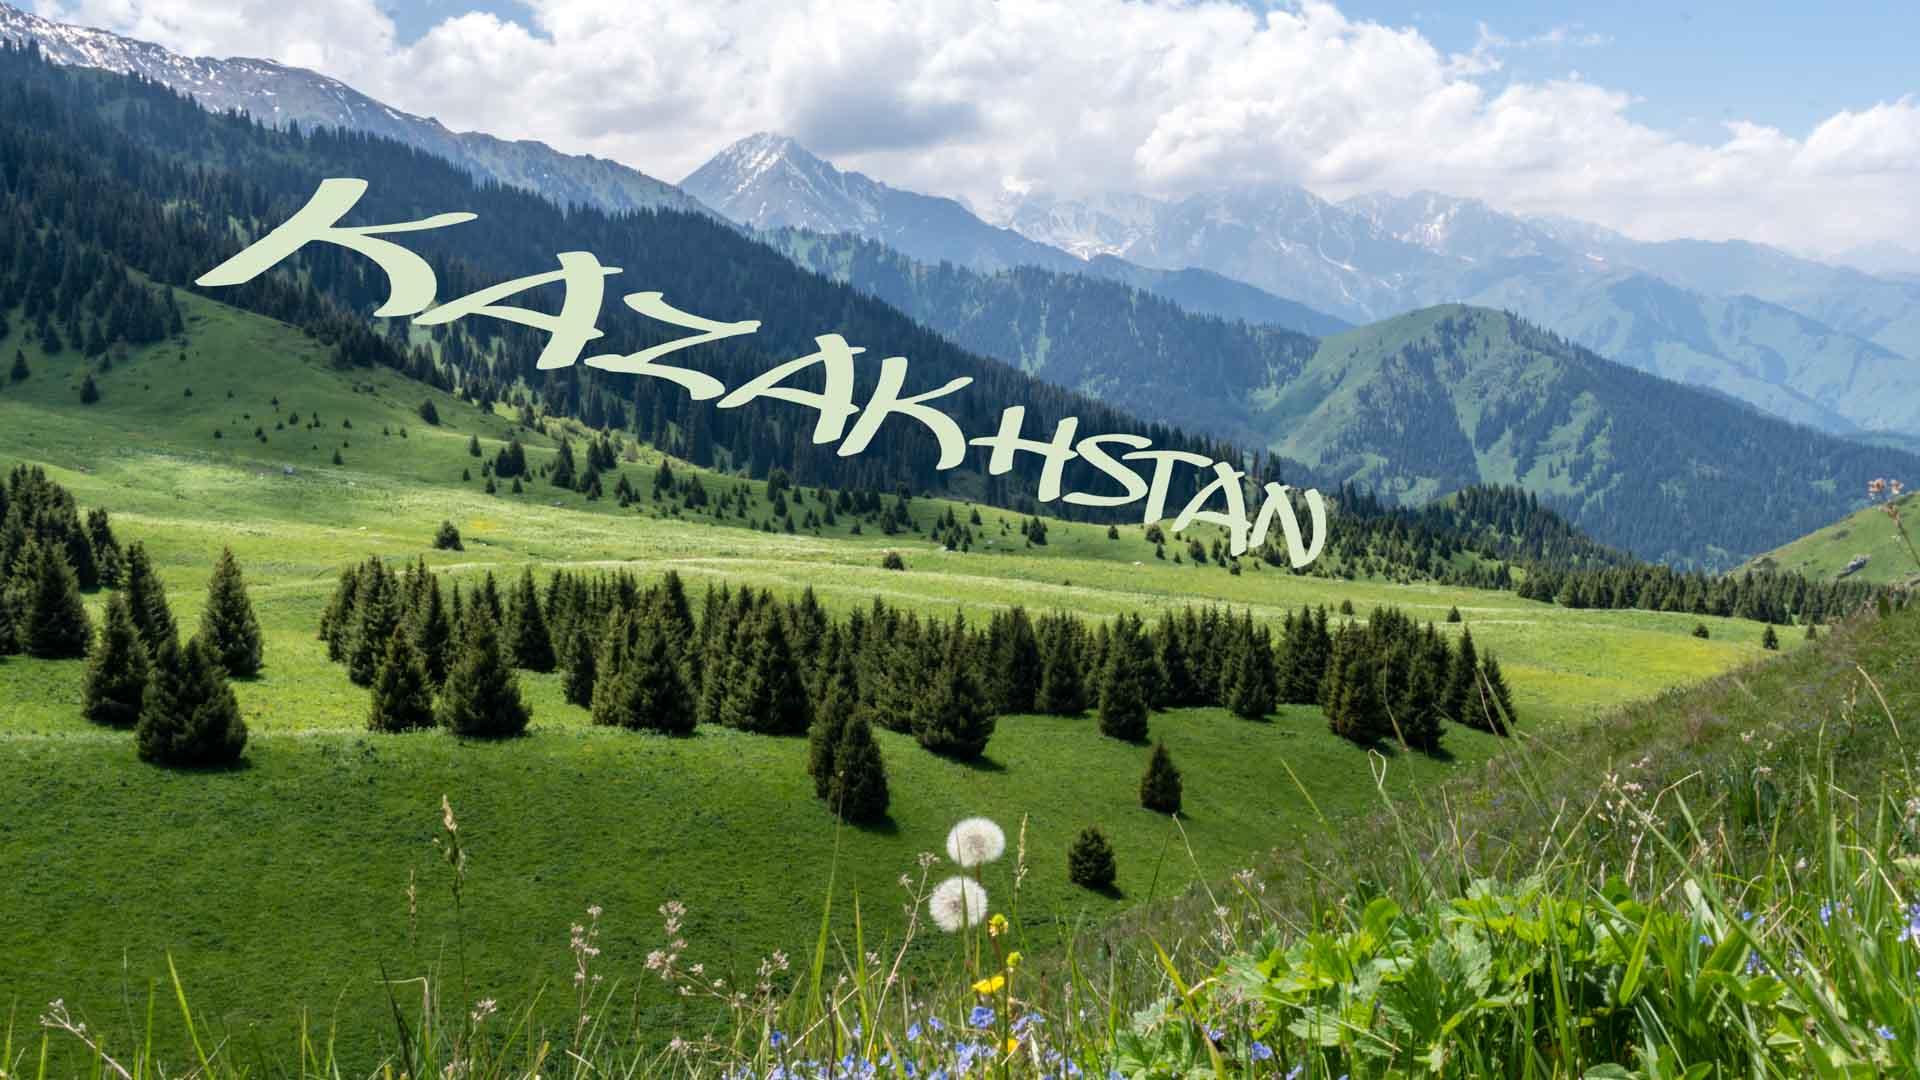 SerialHikers stop autostop world monde tour hitchhiking aventure adventure alternative travel voyage sans avion no fly Kazakhstan destination guide